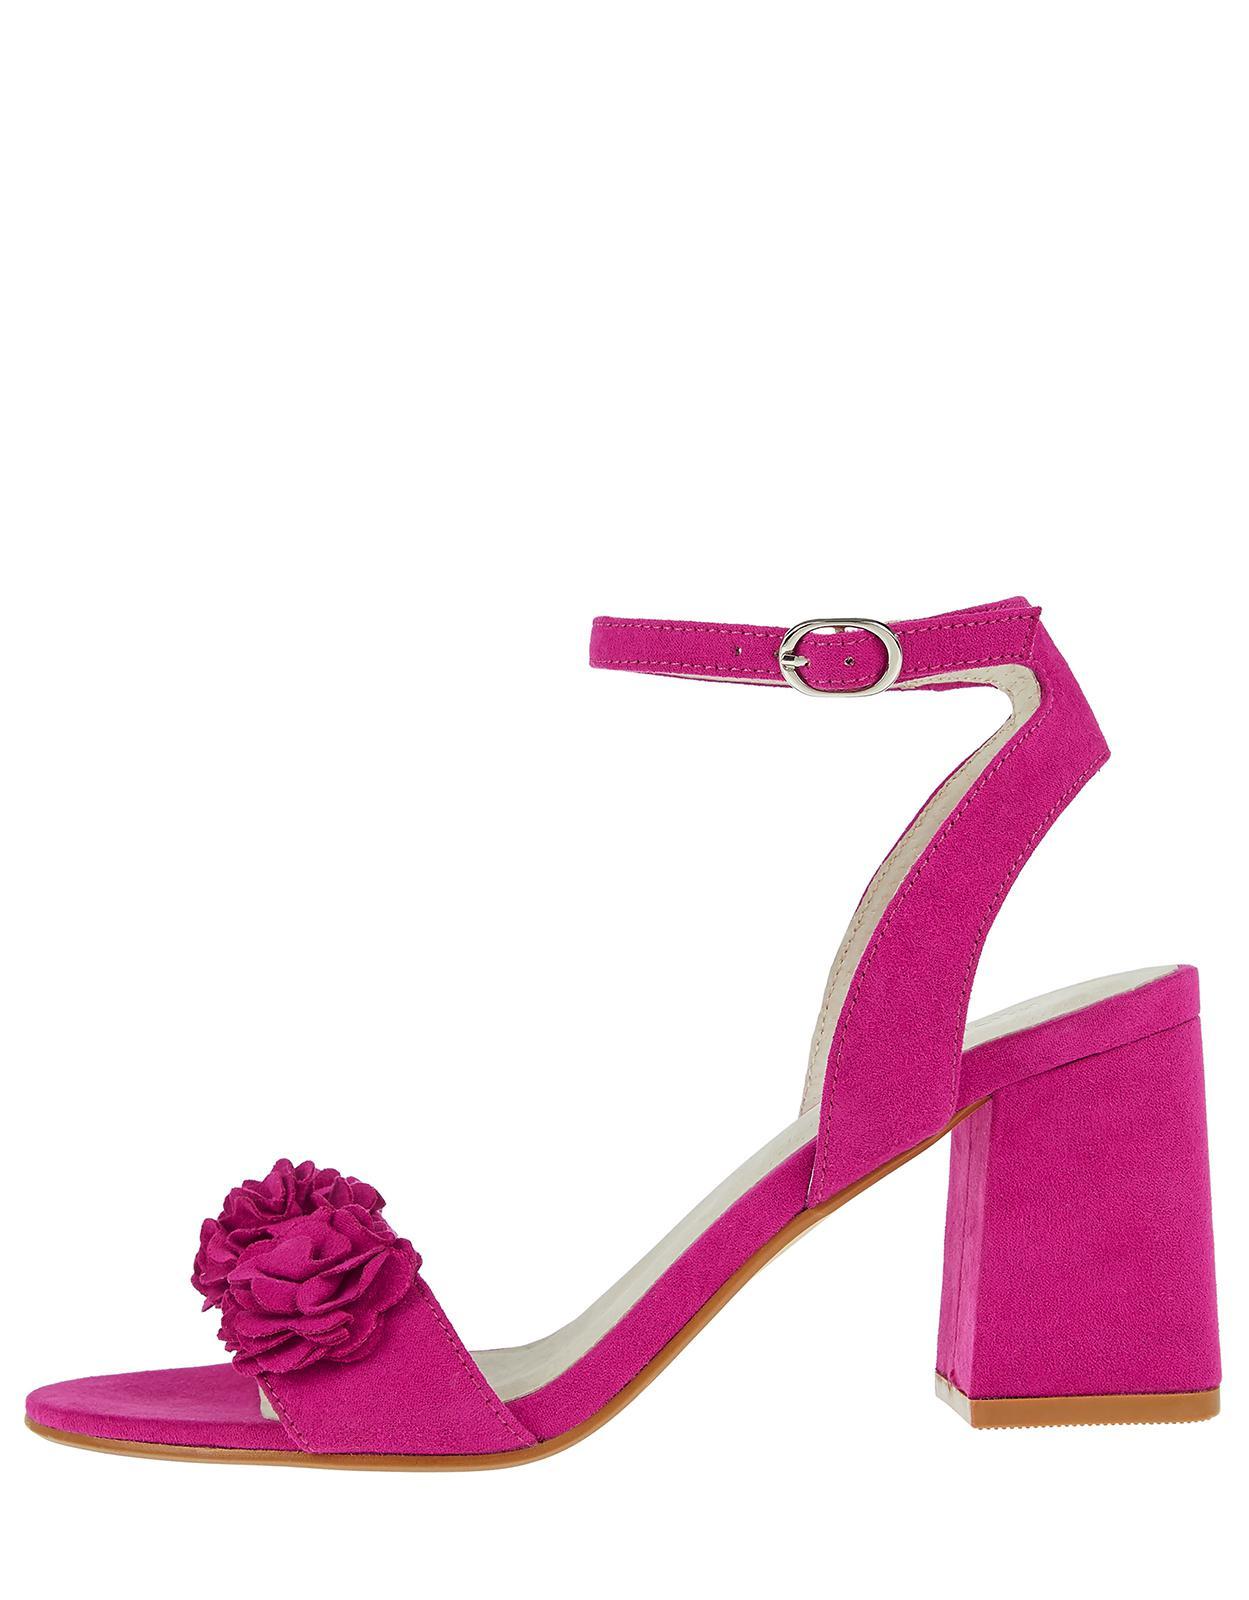 Monsoon Faith Flower Block Heel Sandals In Pink Lyst